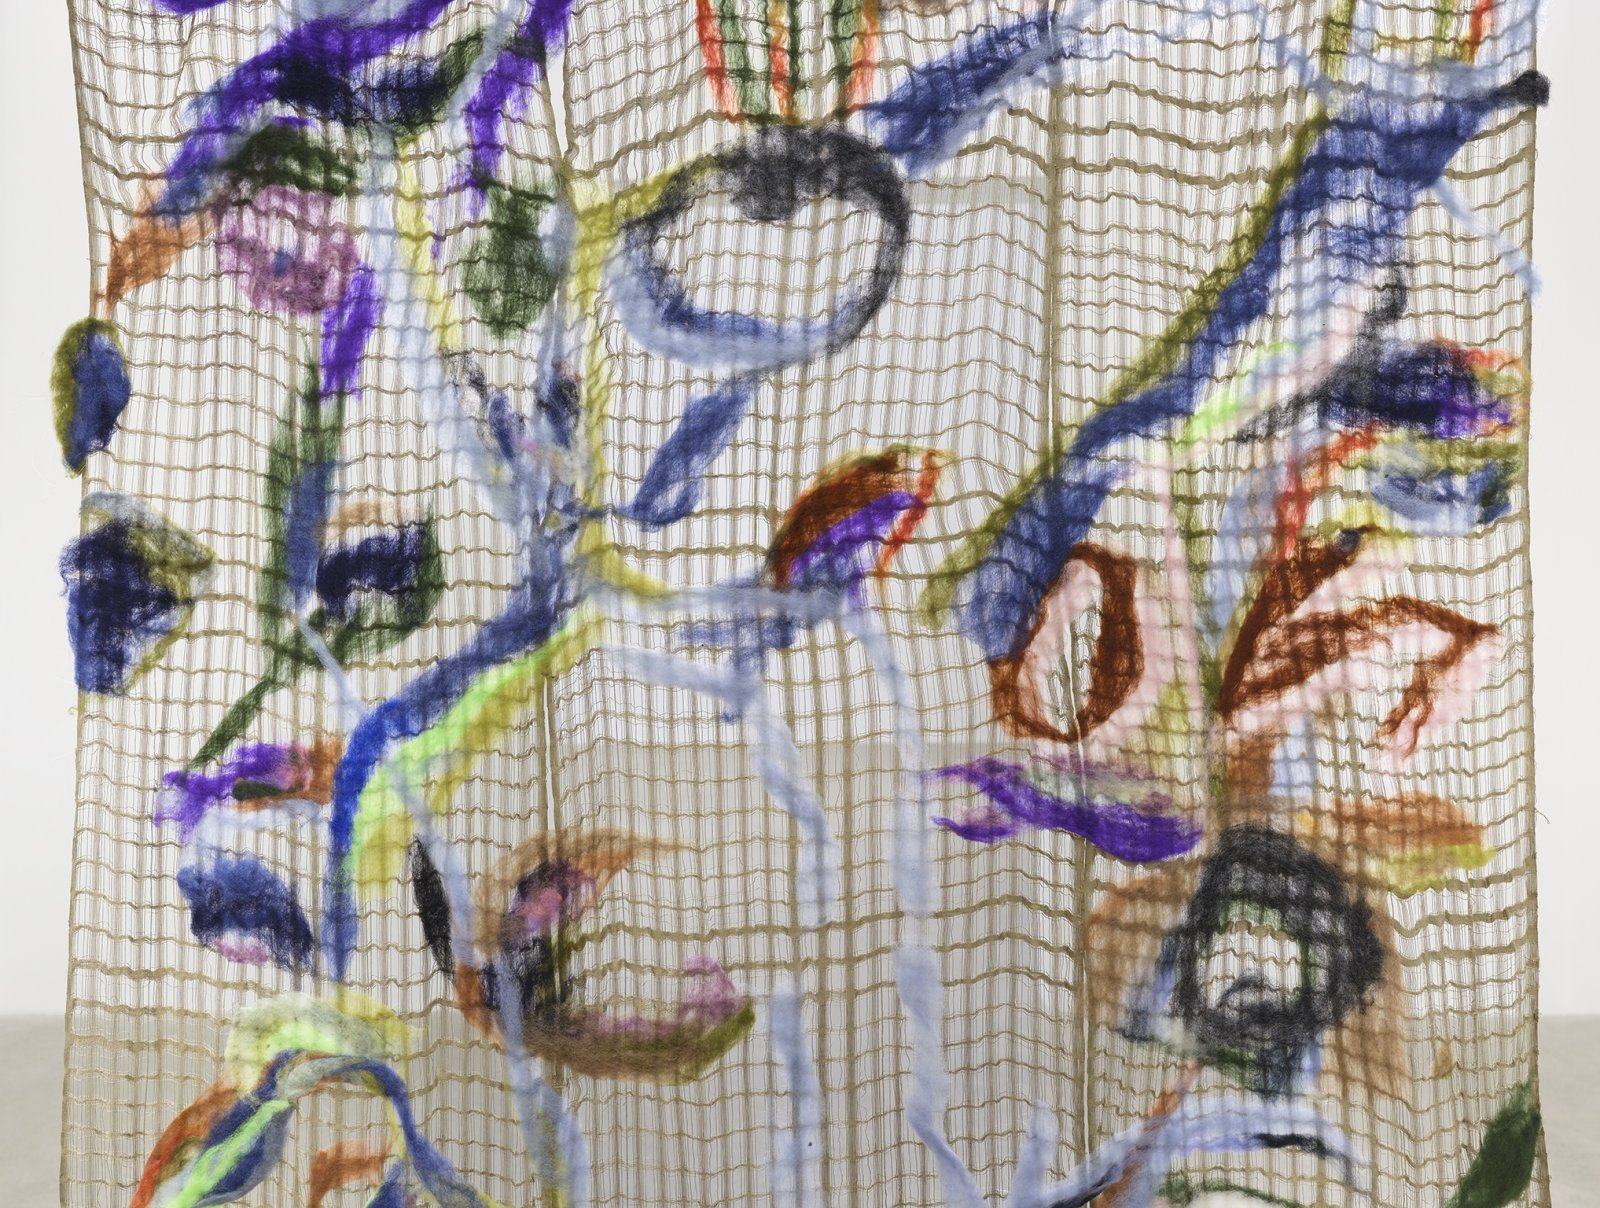 Rebecca Brewer, Surplus World (detail), 2019, silk, wool, steel hooks, 90 x 63 in. (229 x 160 cm)